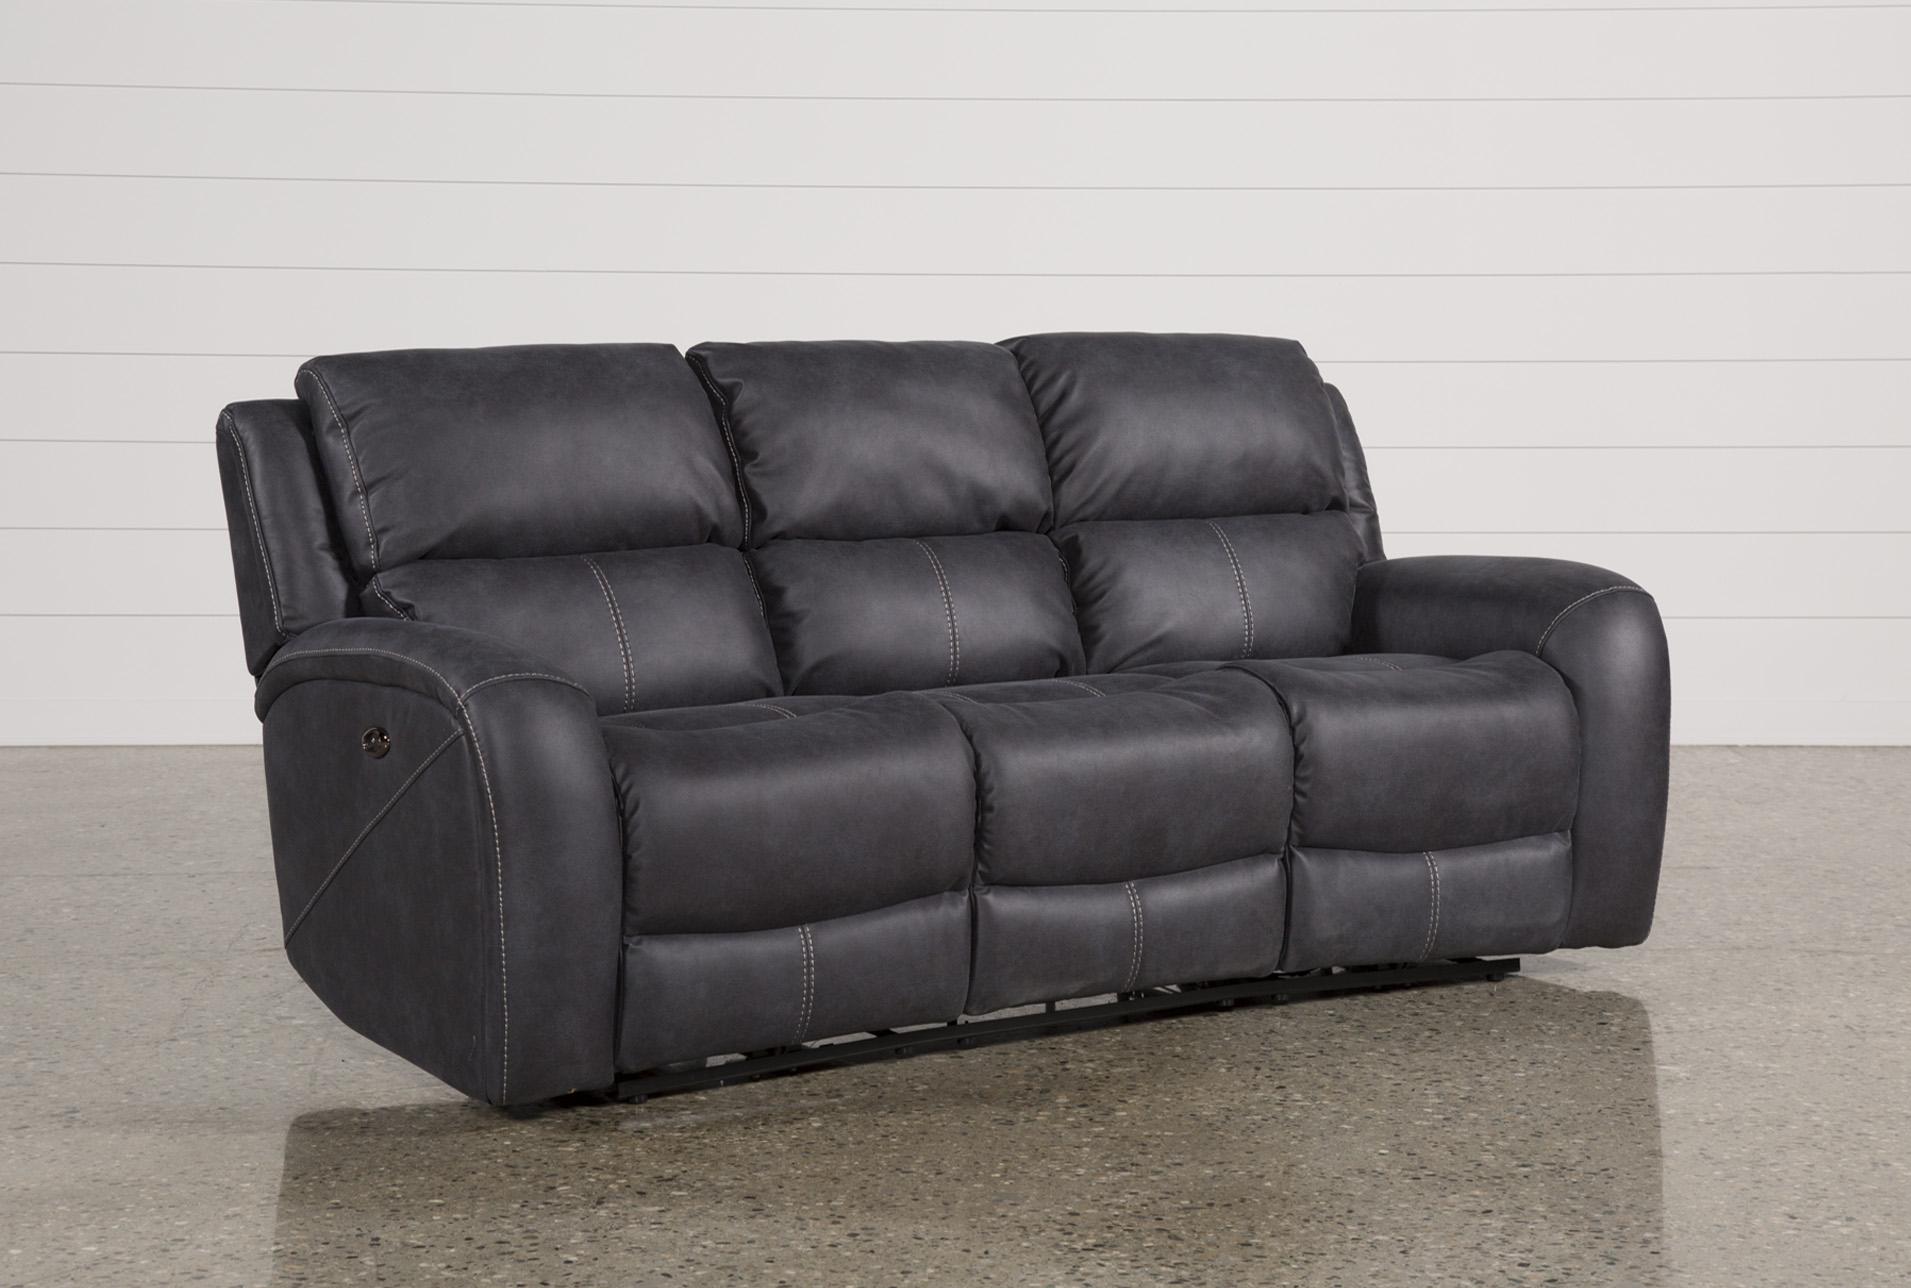 Power Recline Sofa Best Interior Furniture